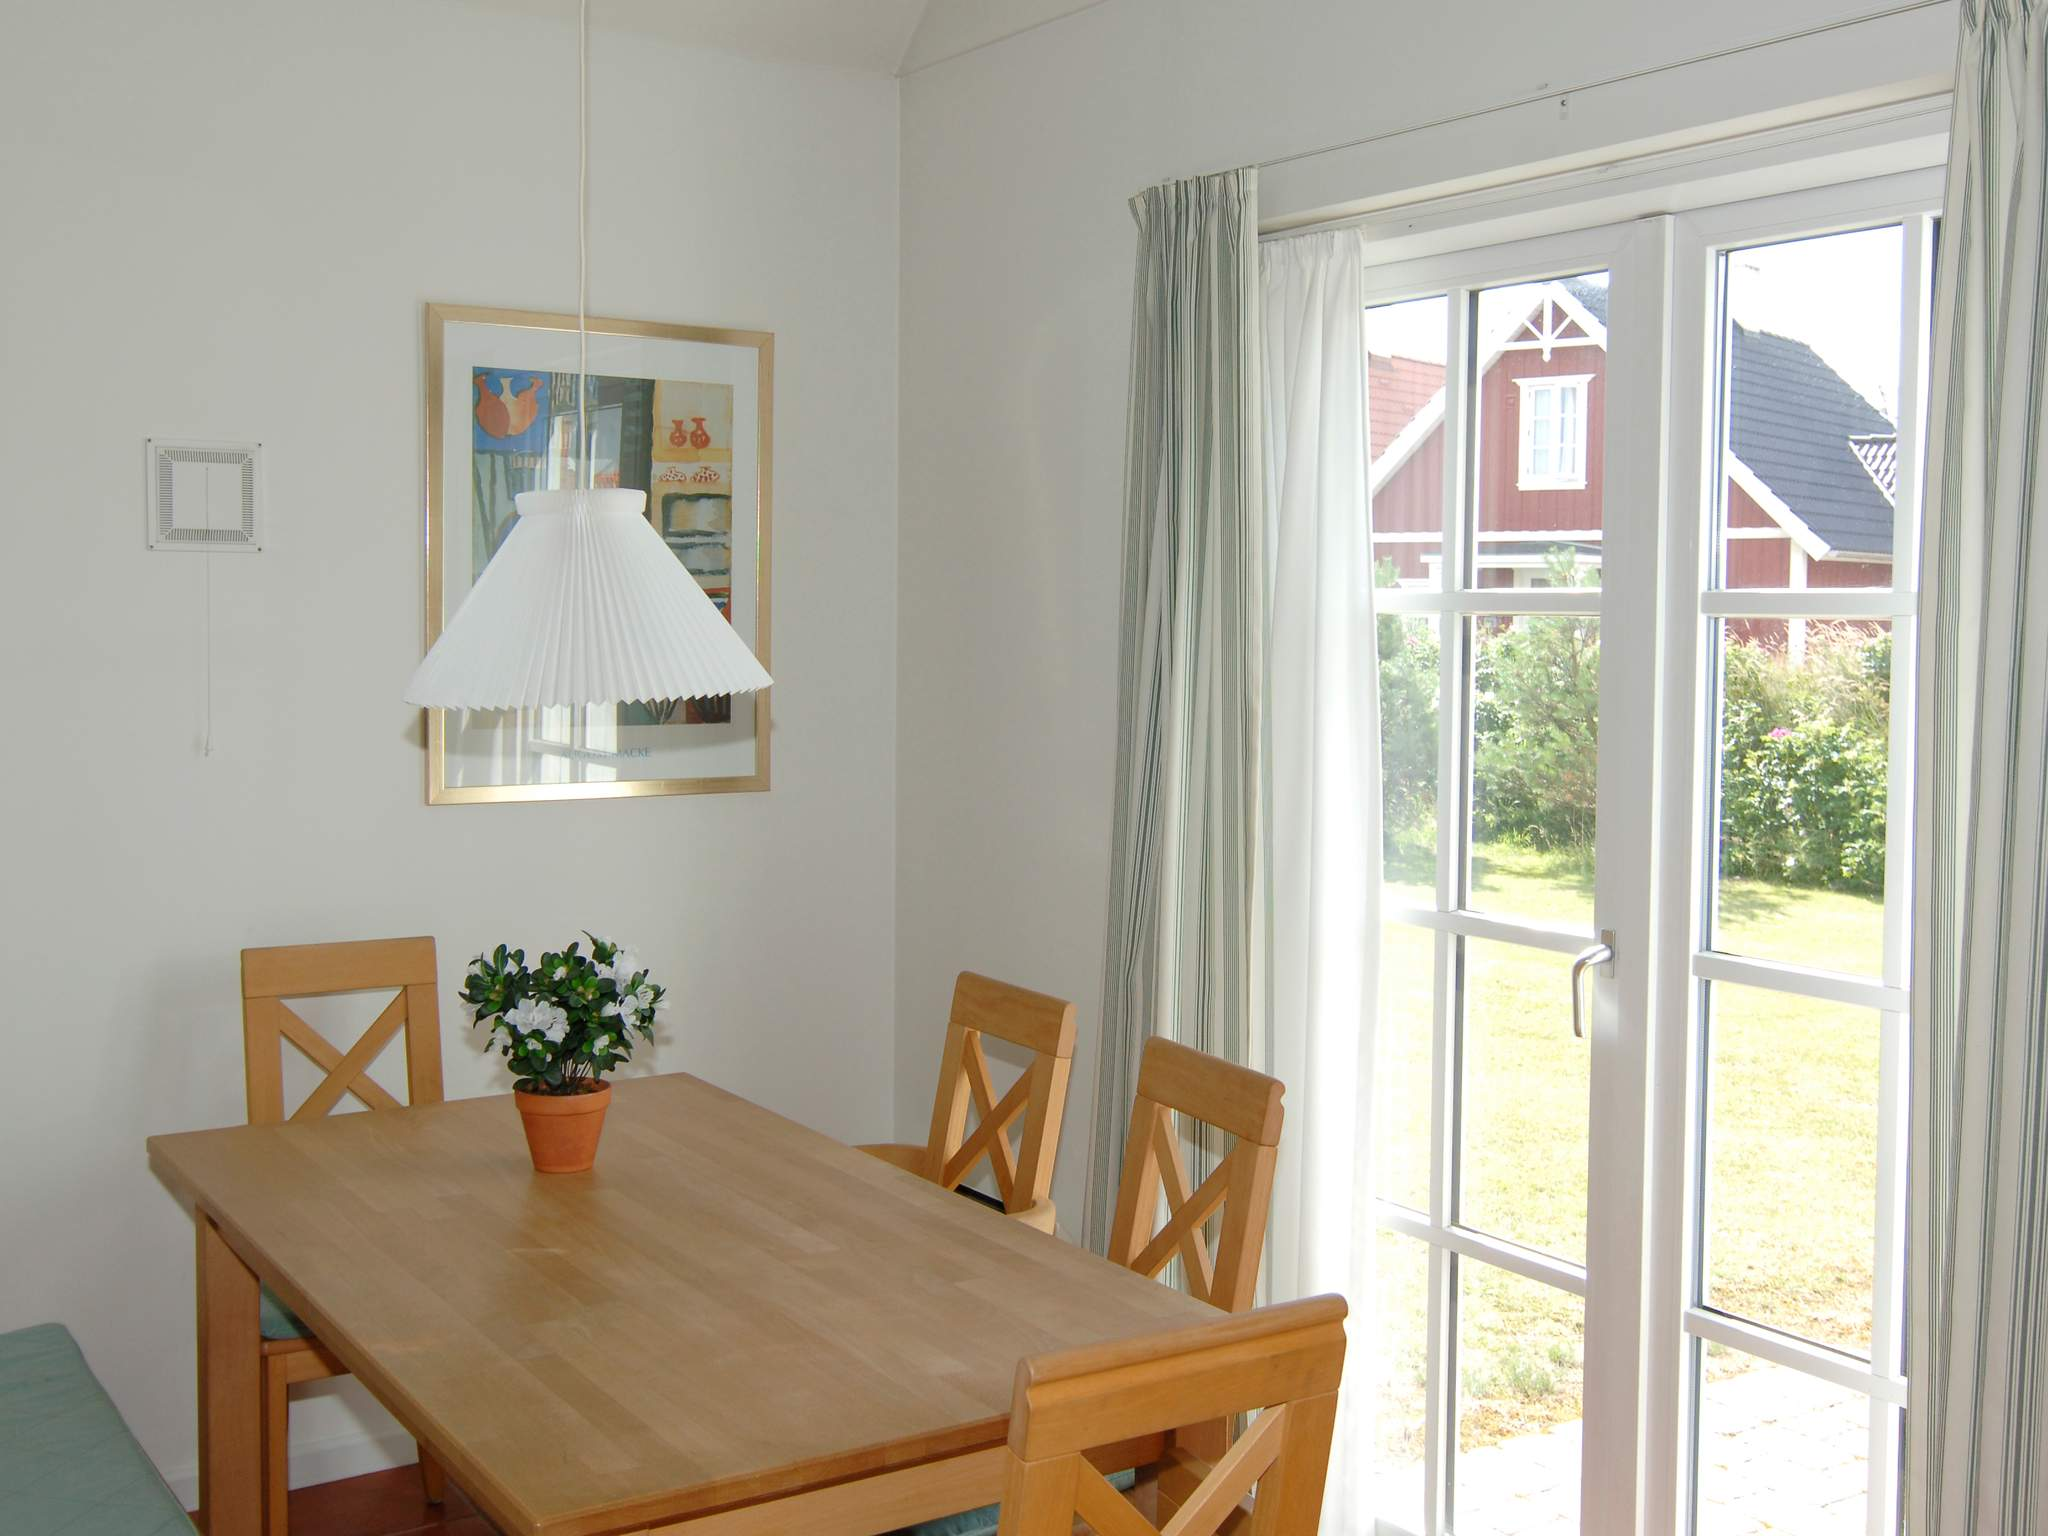 Ferienhaus Blåvand (241694), Blåvand, , Westjütland, Dänemark, Bild 3